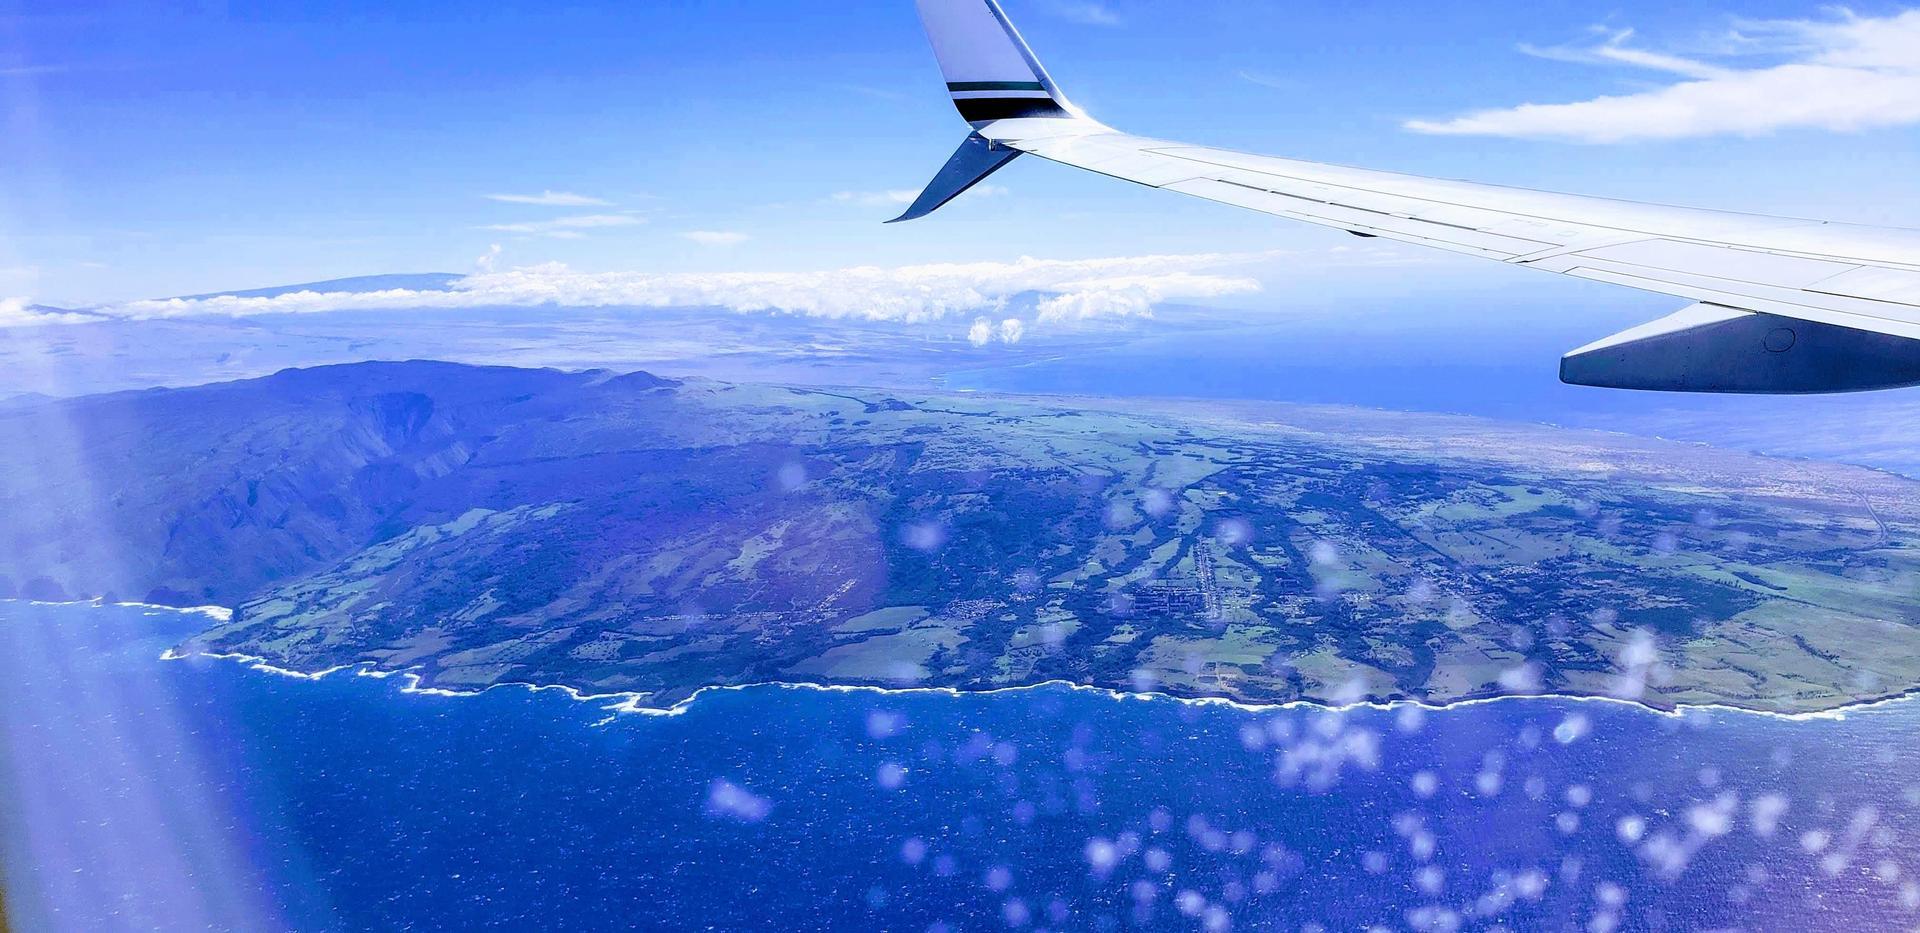 Island and airplane